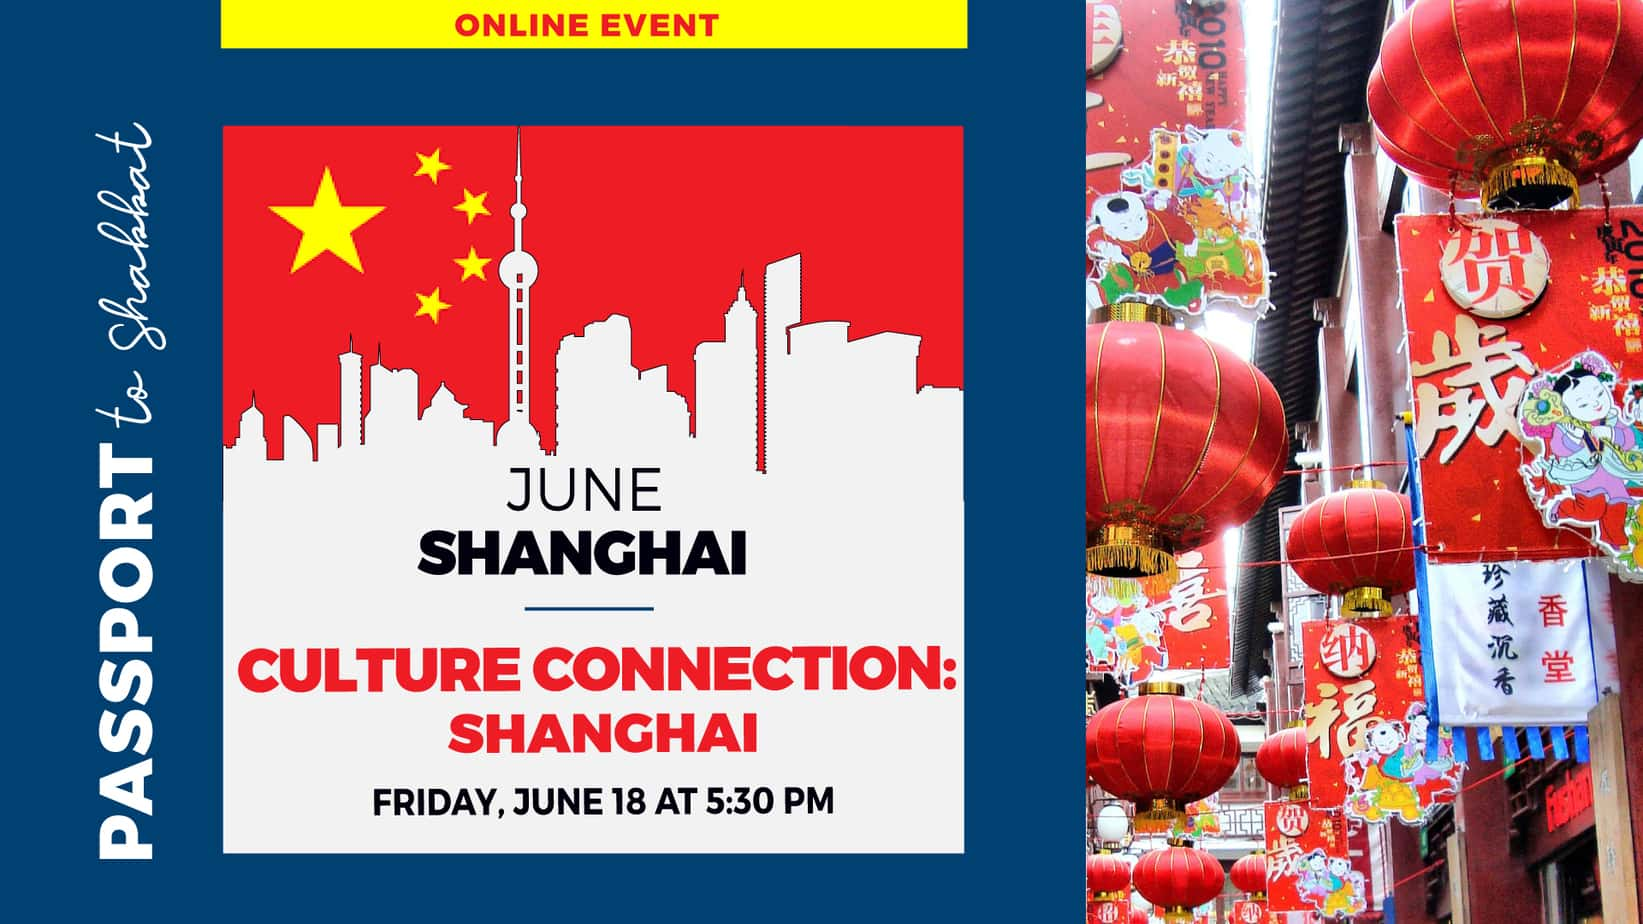 xSocial Media June 18 - online event